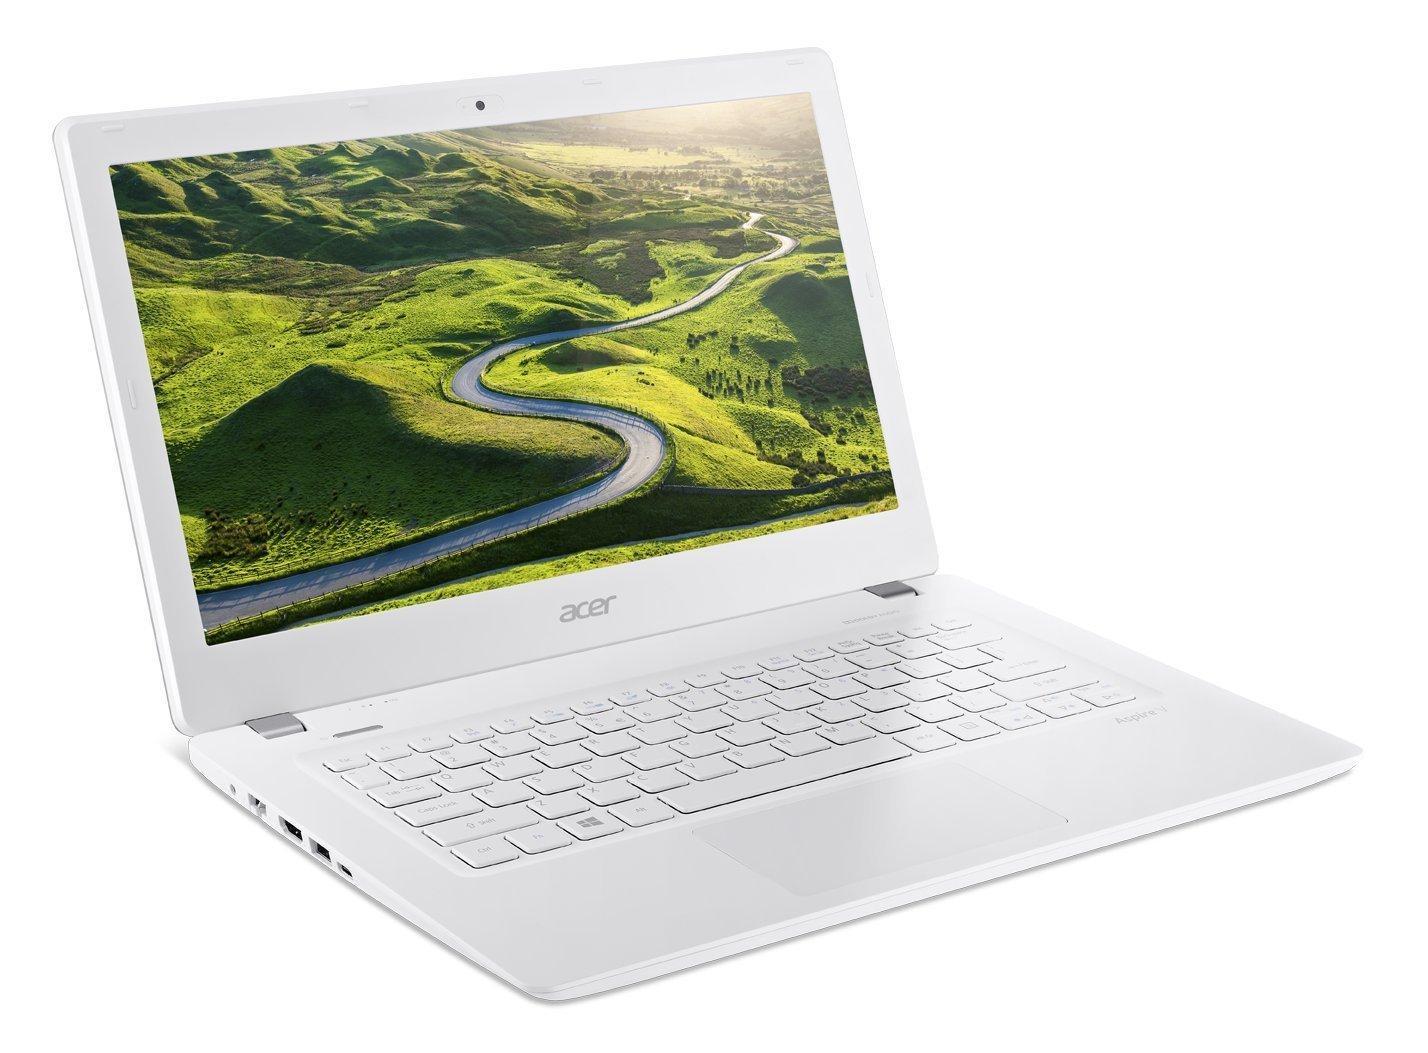 "PC Portable 13"" Acer Aspire V3-372T-53LA Blanc - Tactile, Full HD, Intel Core i5-6200U, RAM 8 Go, HDD 1 To, Windows 10"